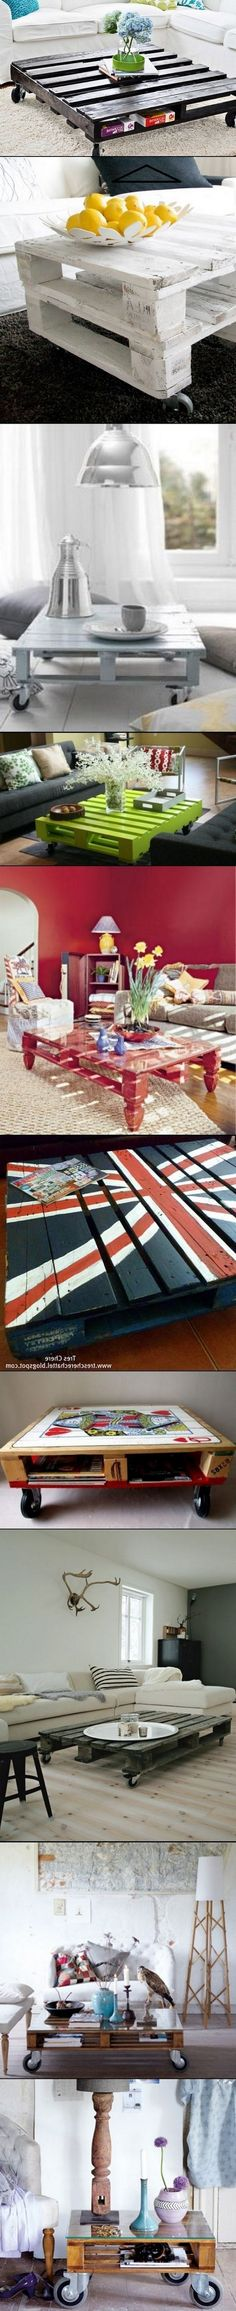 DIY Home decor Tables